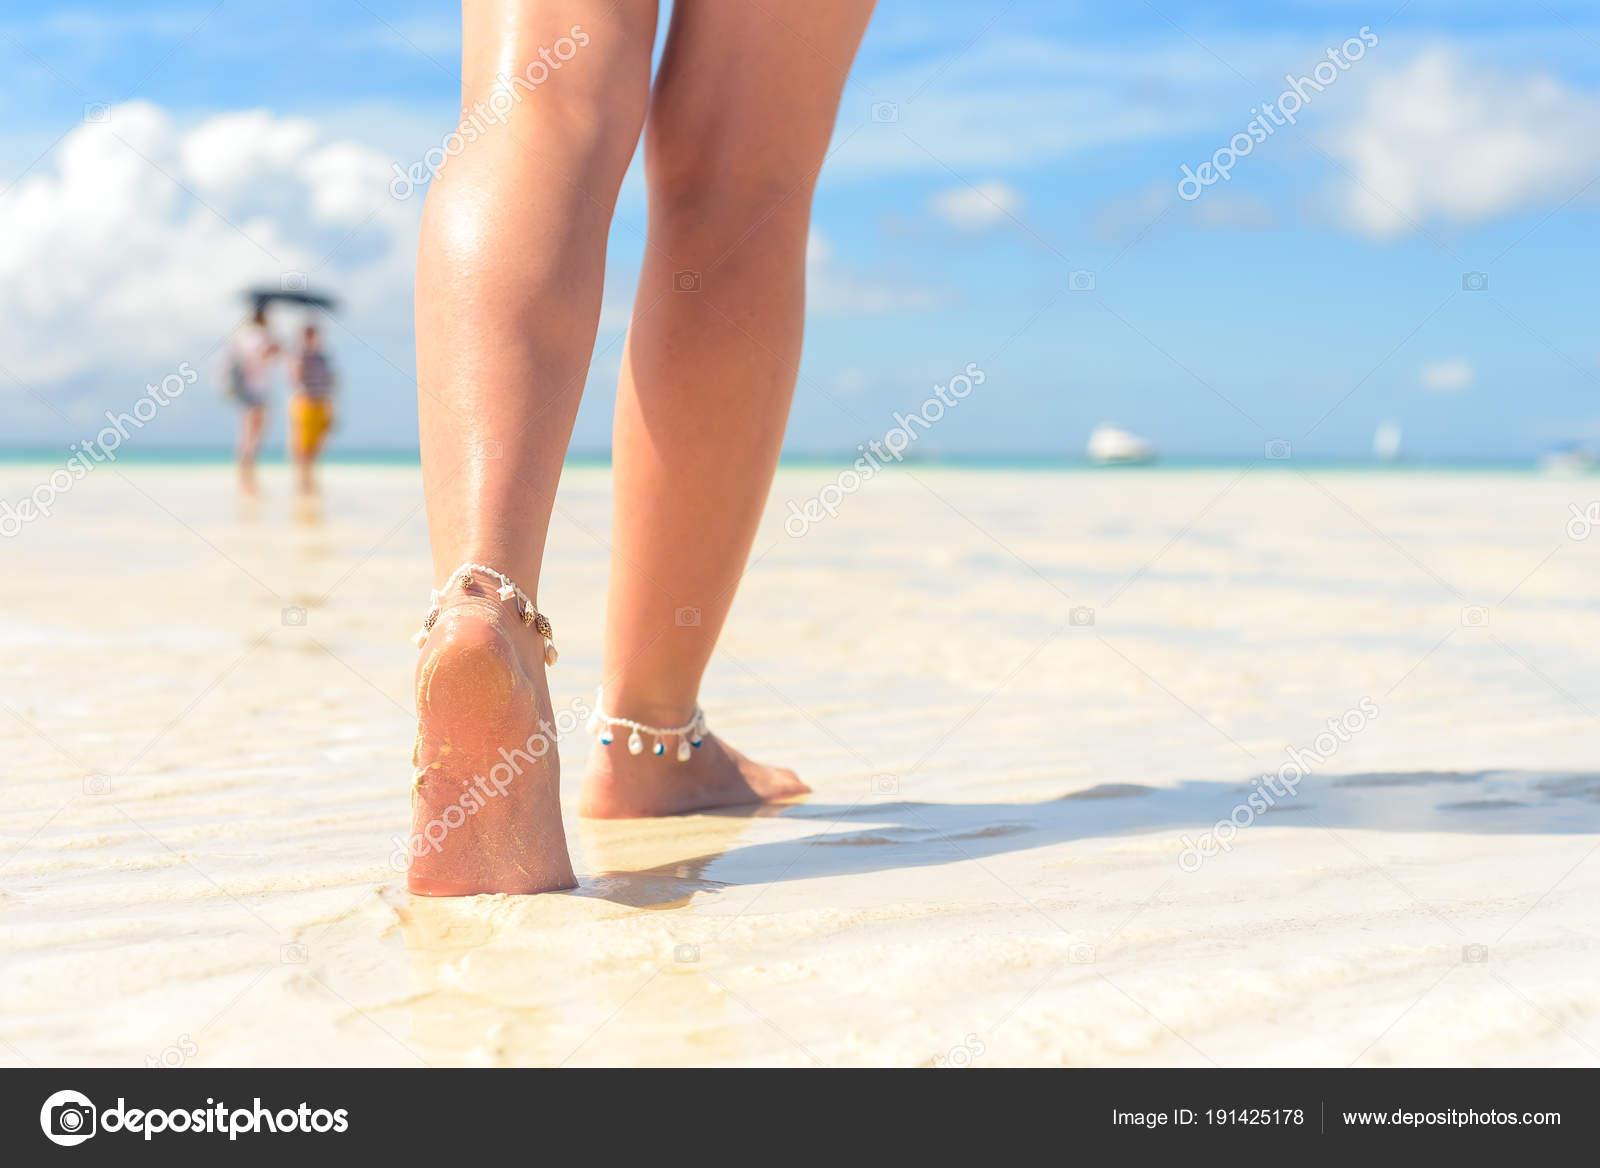 55511d6e16 Παραλία έννοια του ταξιδιού. Σέξι πόδια σε τροπική παραλία με άμμο.  Περπάτημα γυναικεία πόδια. Κινηματογράφηση σε πρώτο πλάνο — Εικόνα από ...